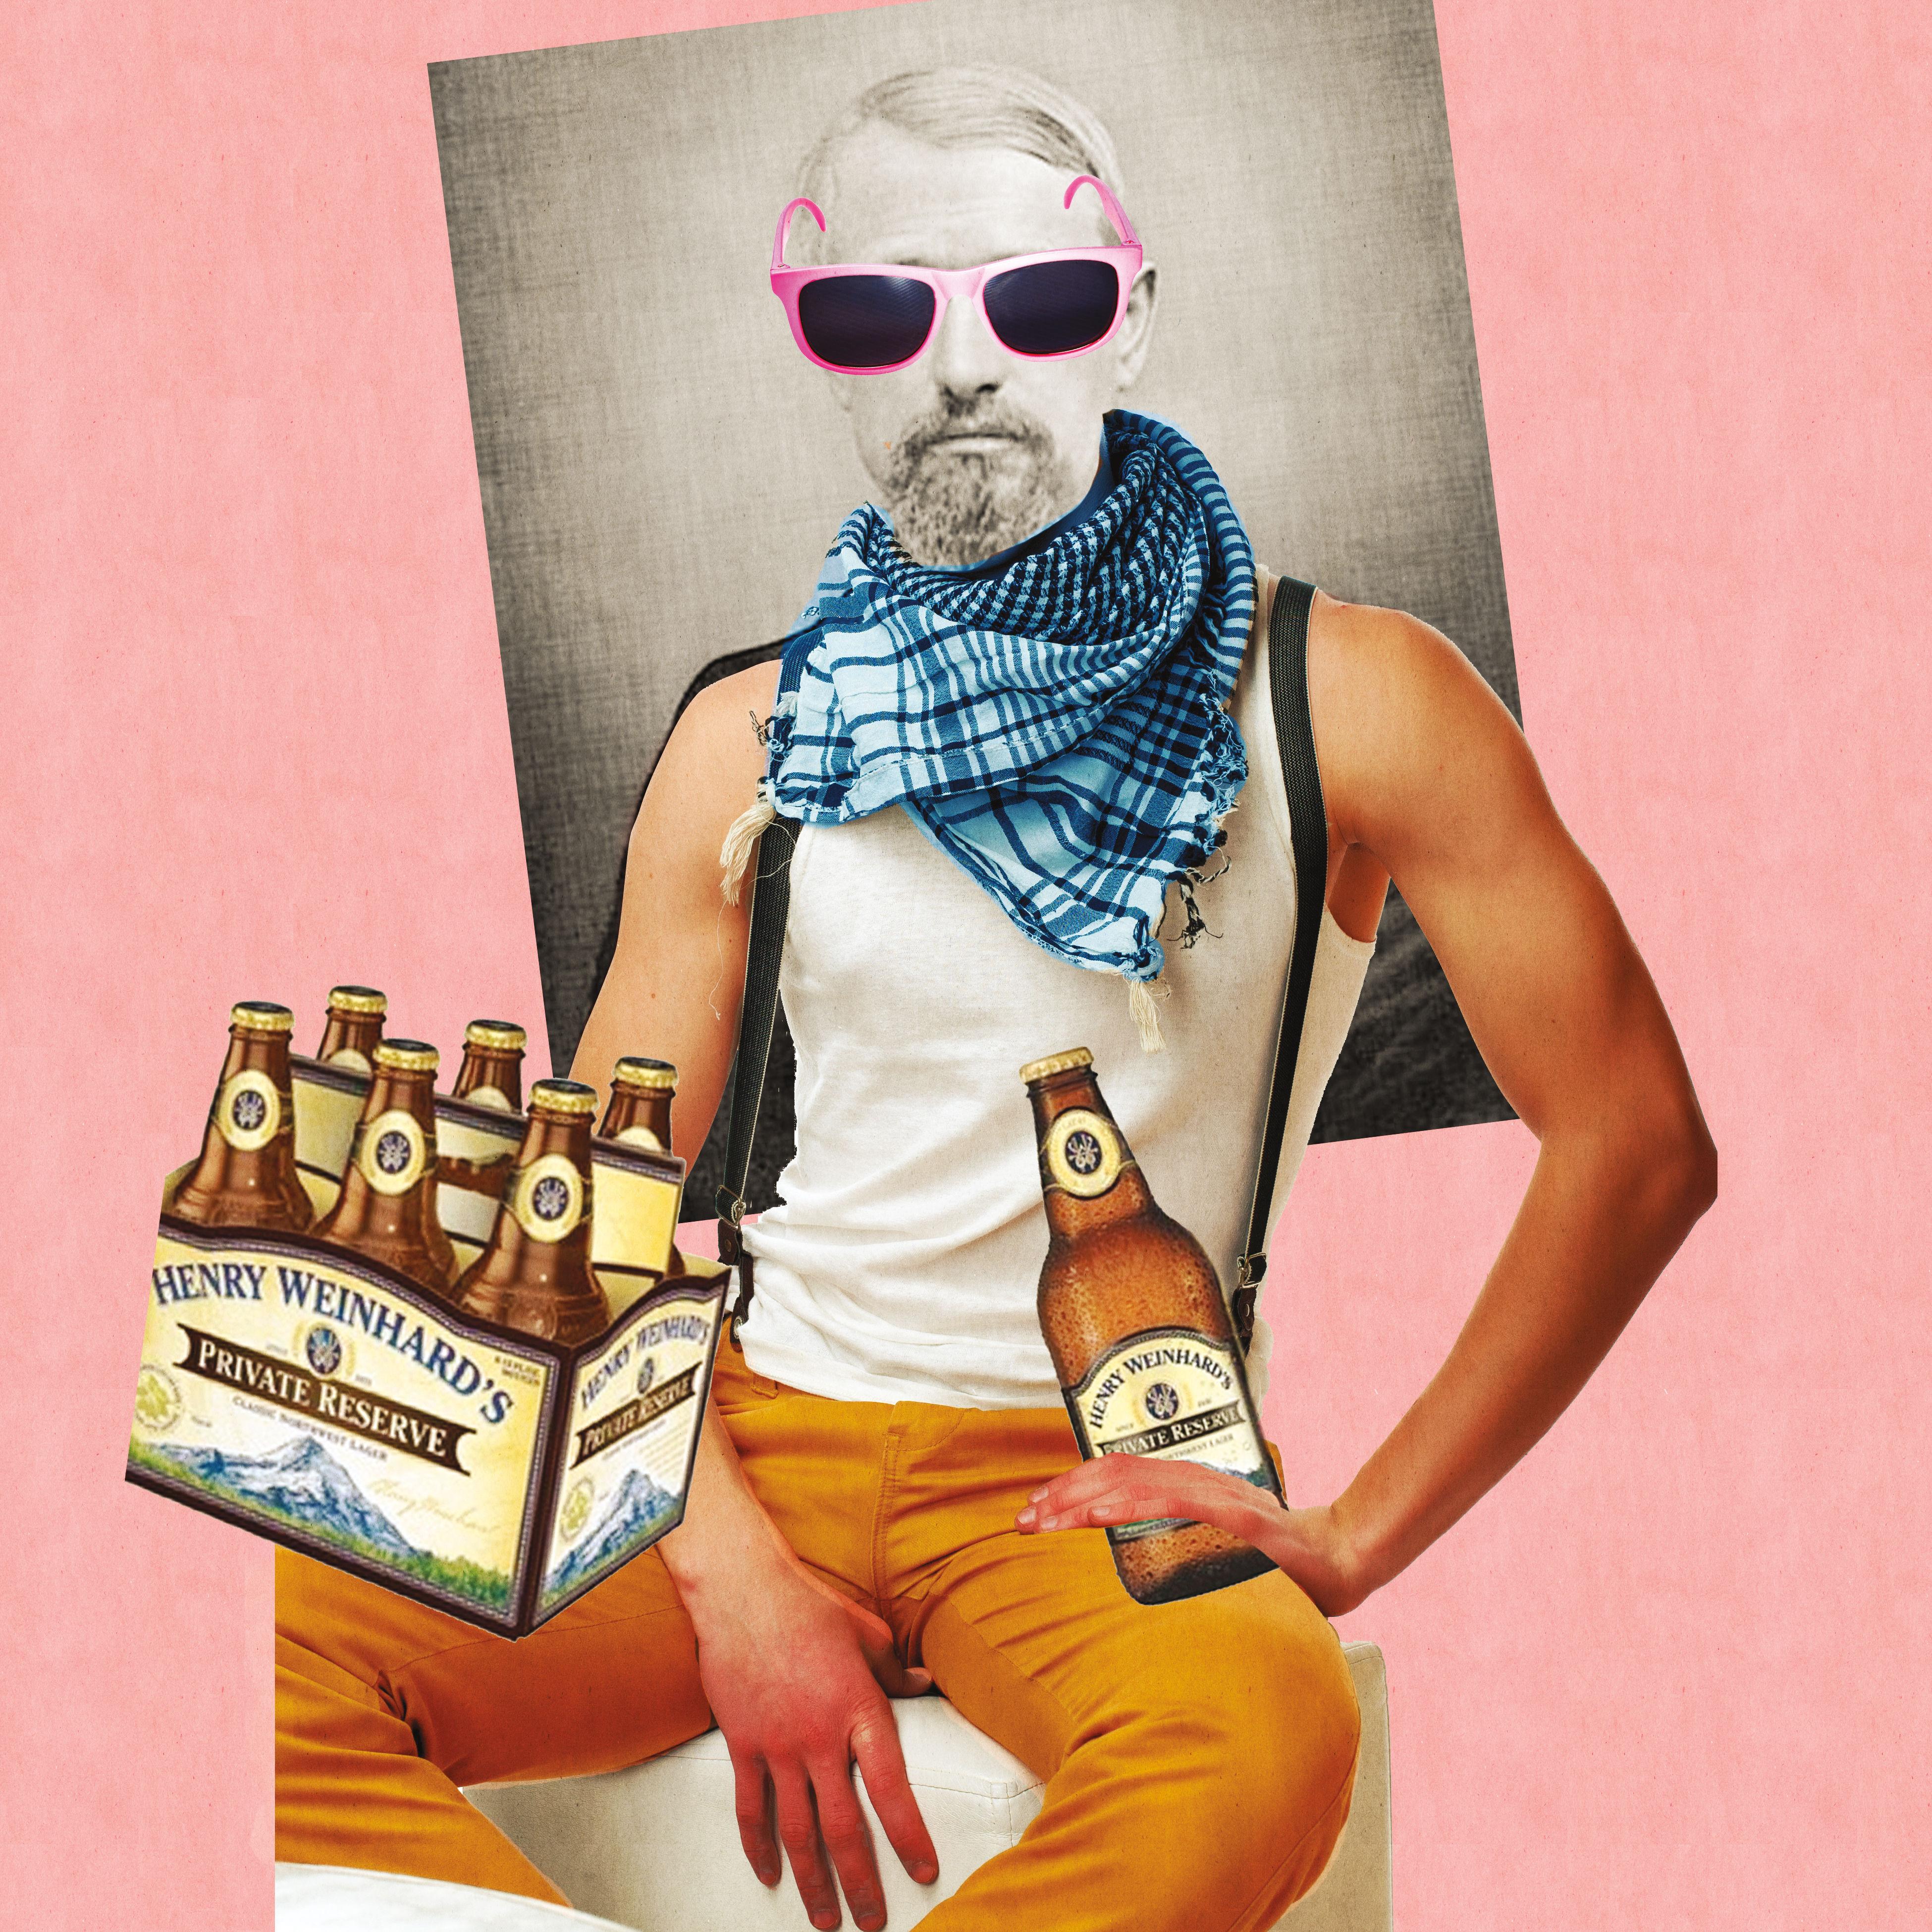 0717 beer henry weinhard okspbr